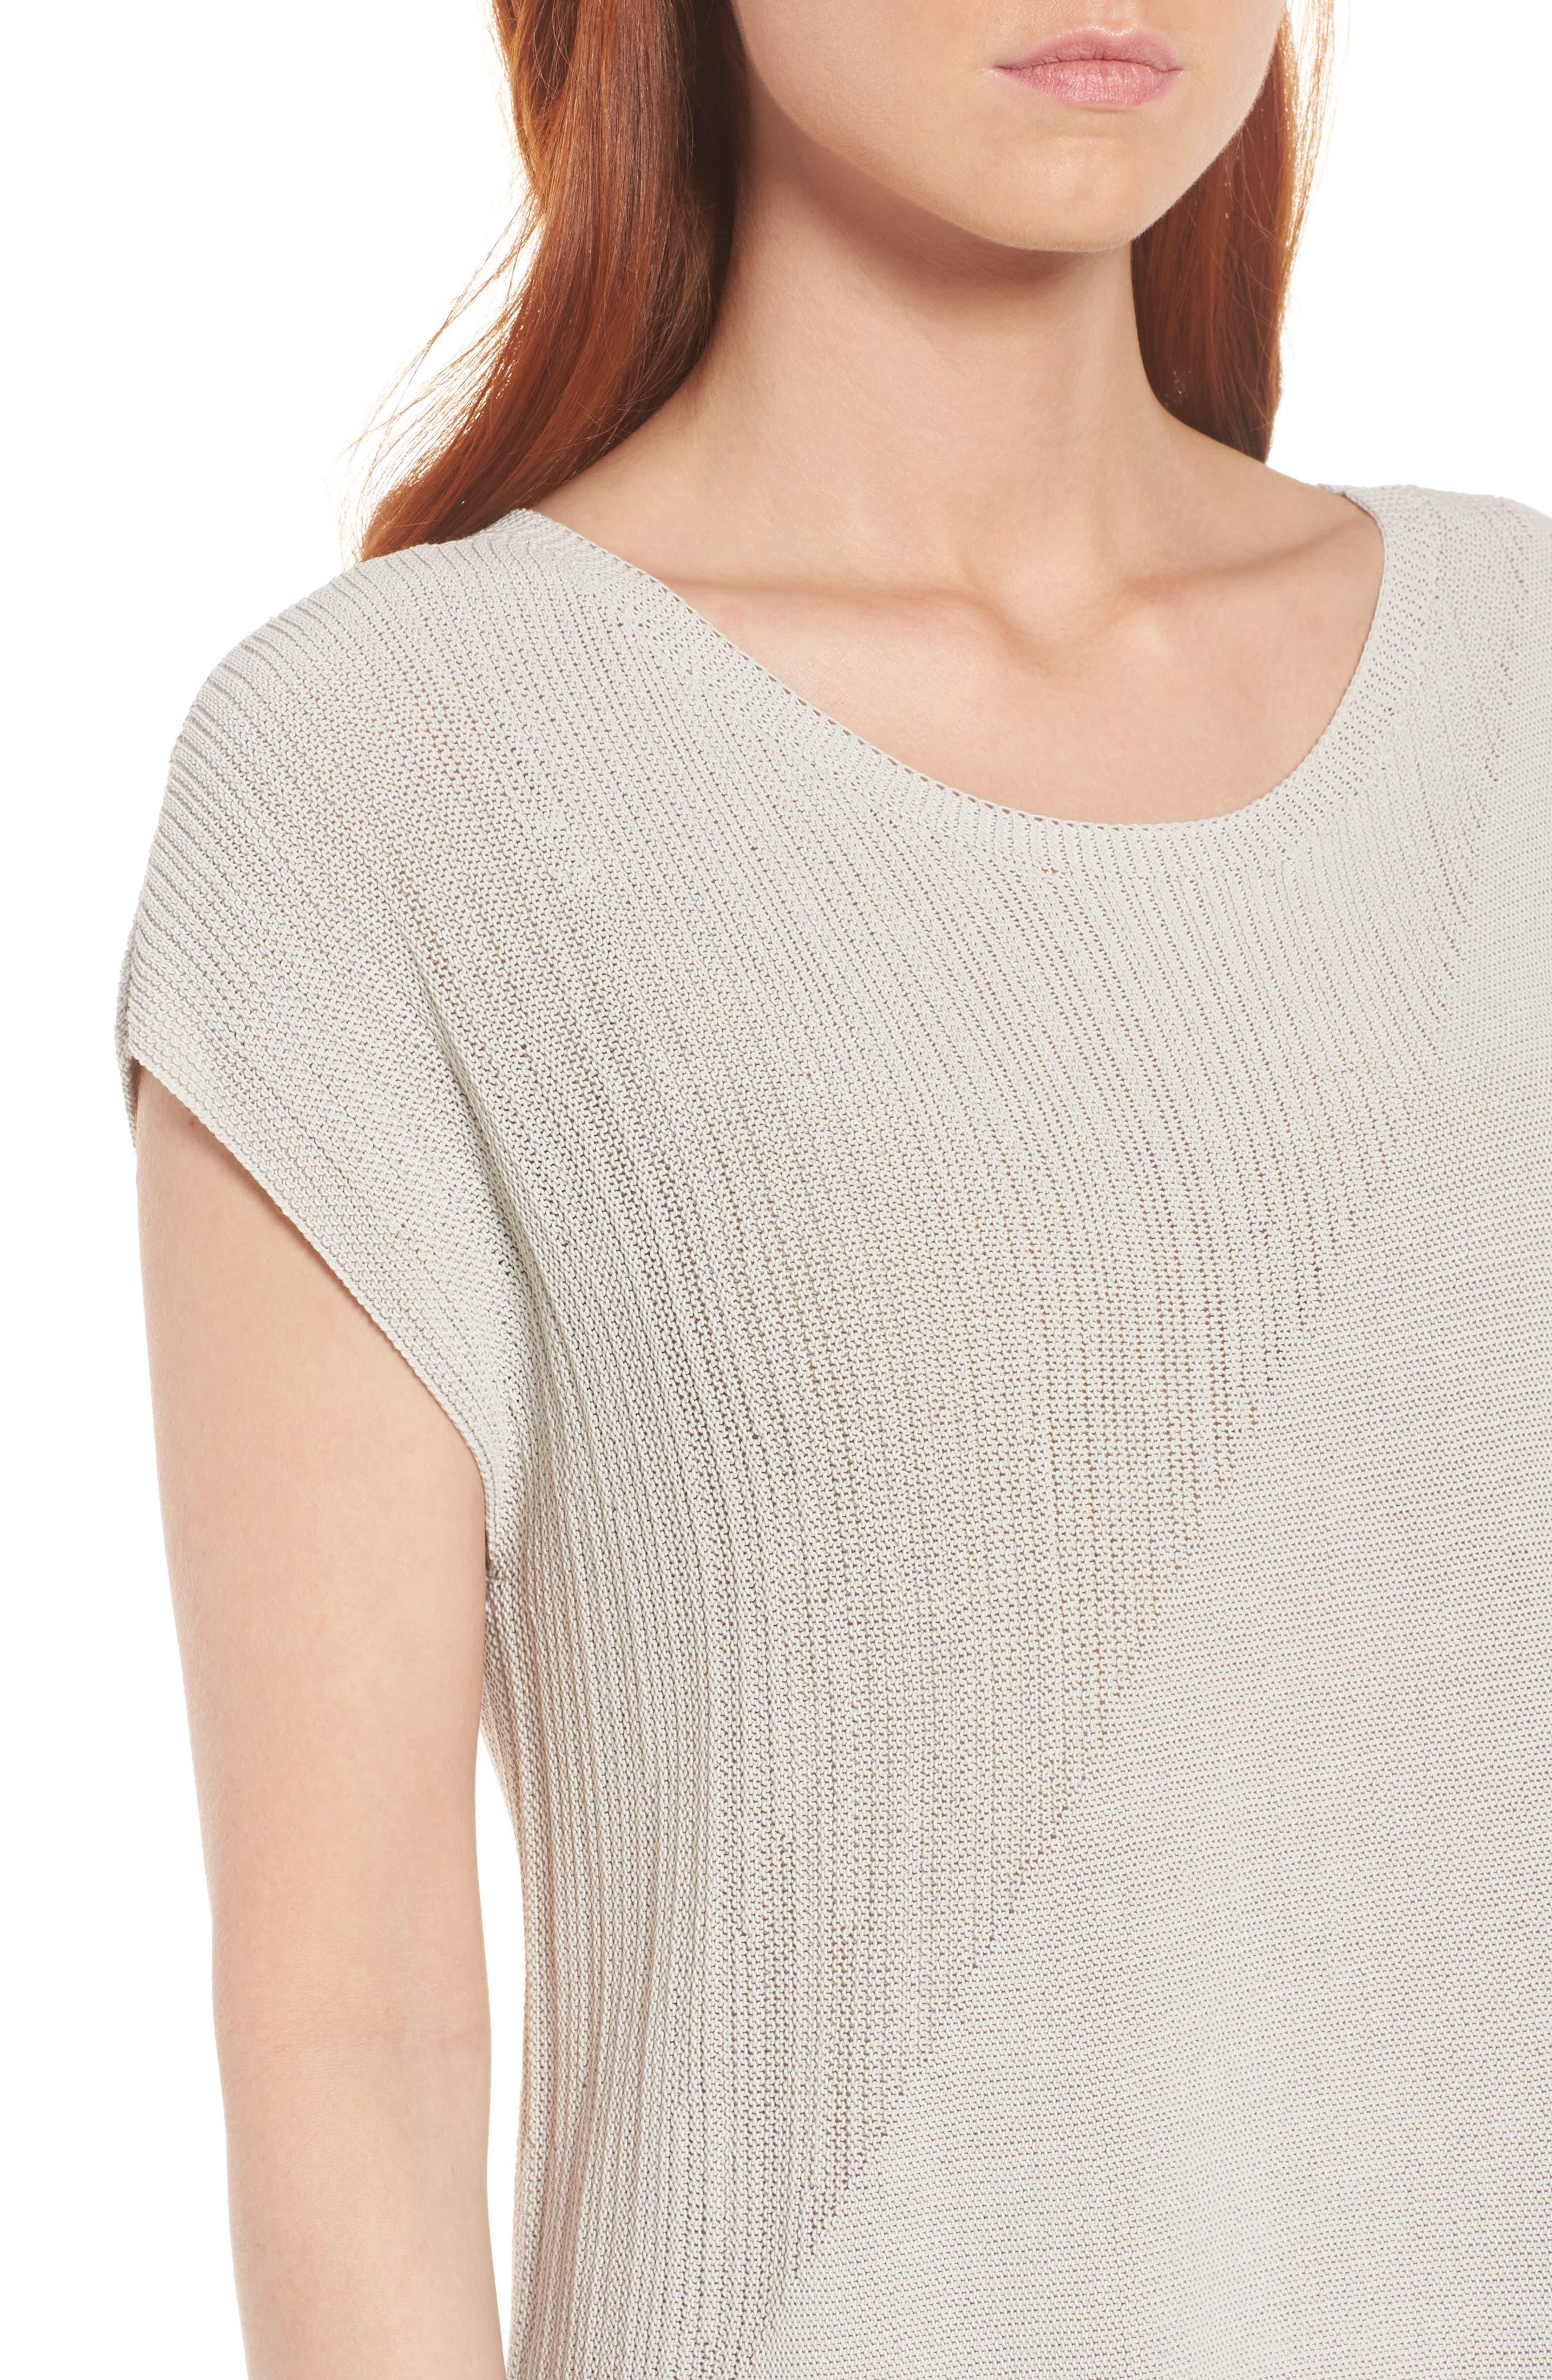 Organic Cotton Tunic Top,                             Alternate thumbnail 4, color,                             907